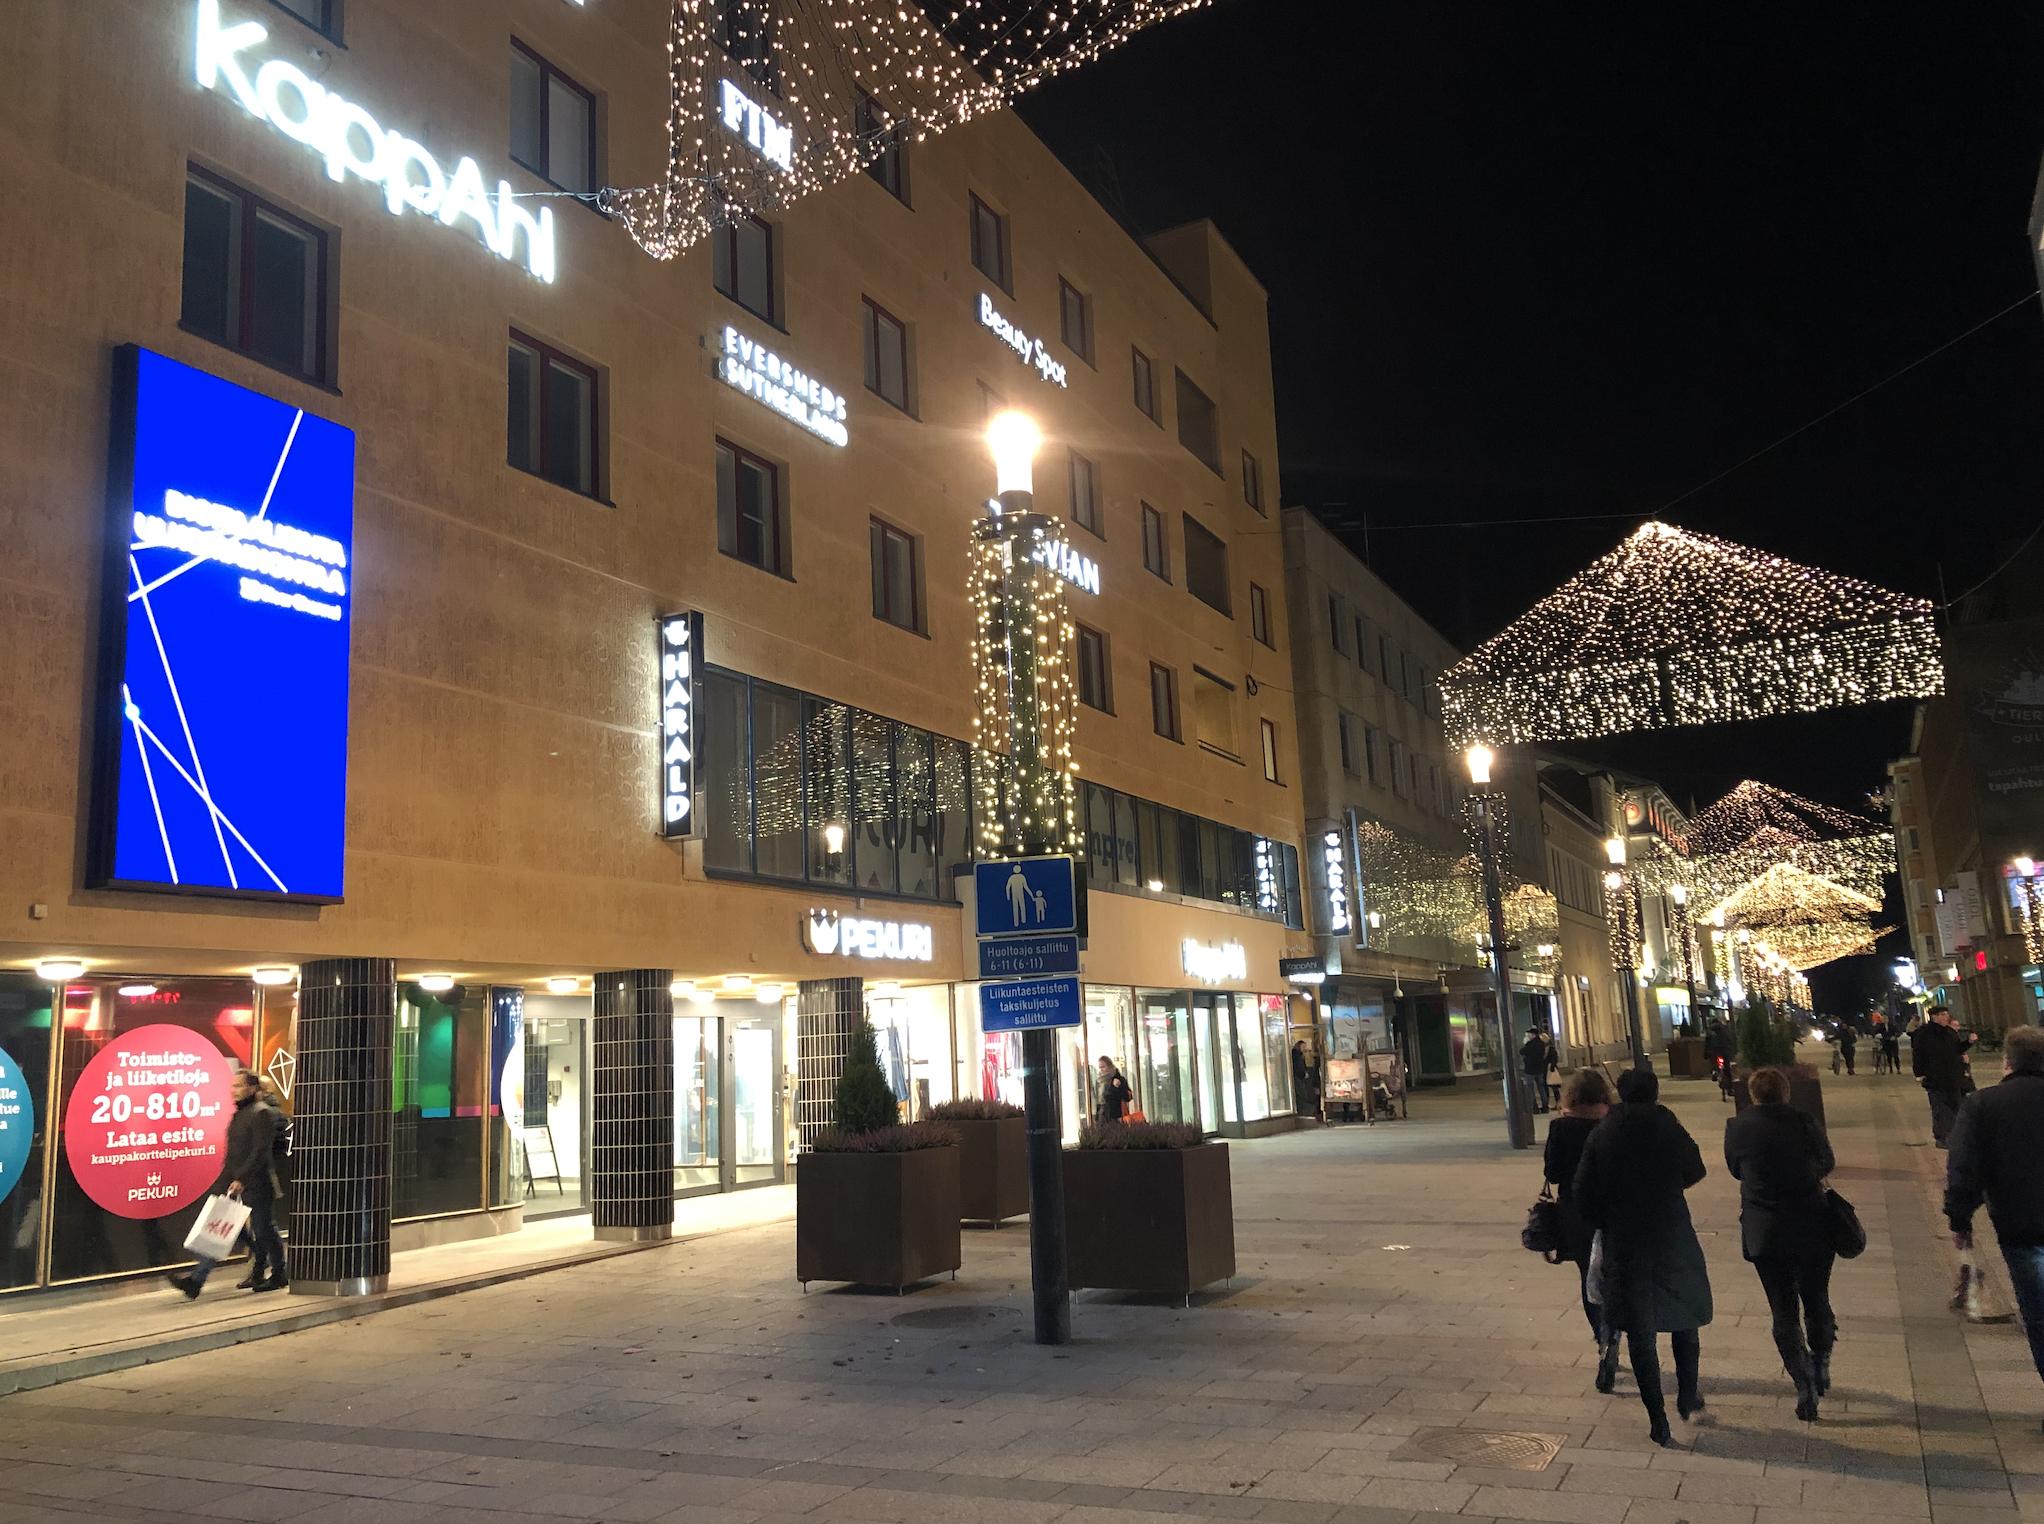 Dig-it asensi P4 led-ulkonäytön Oulun Ra